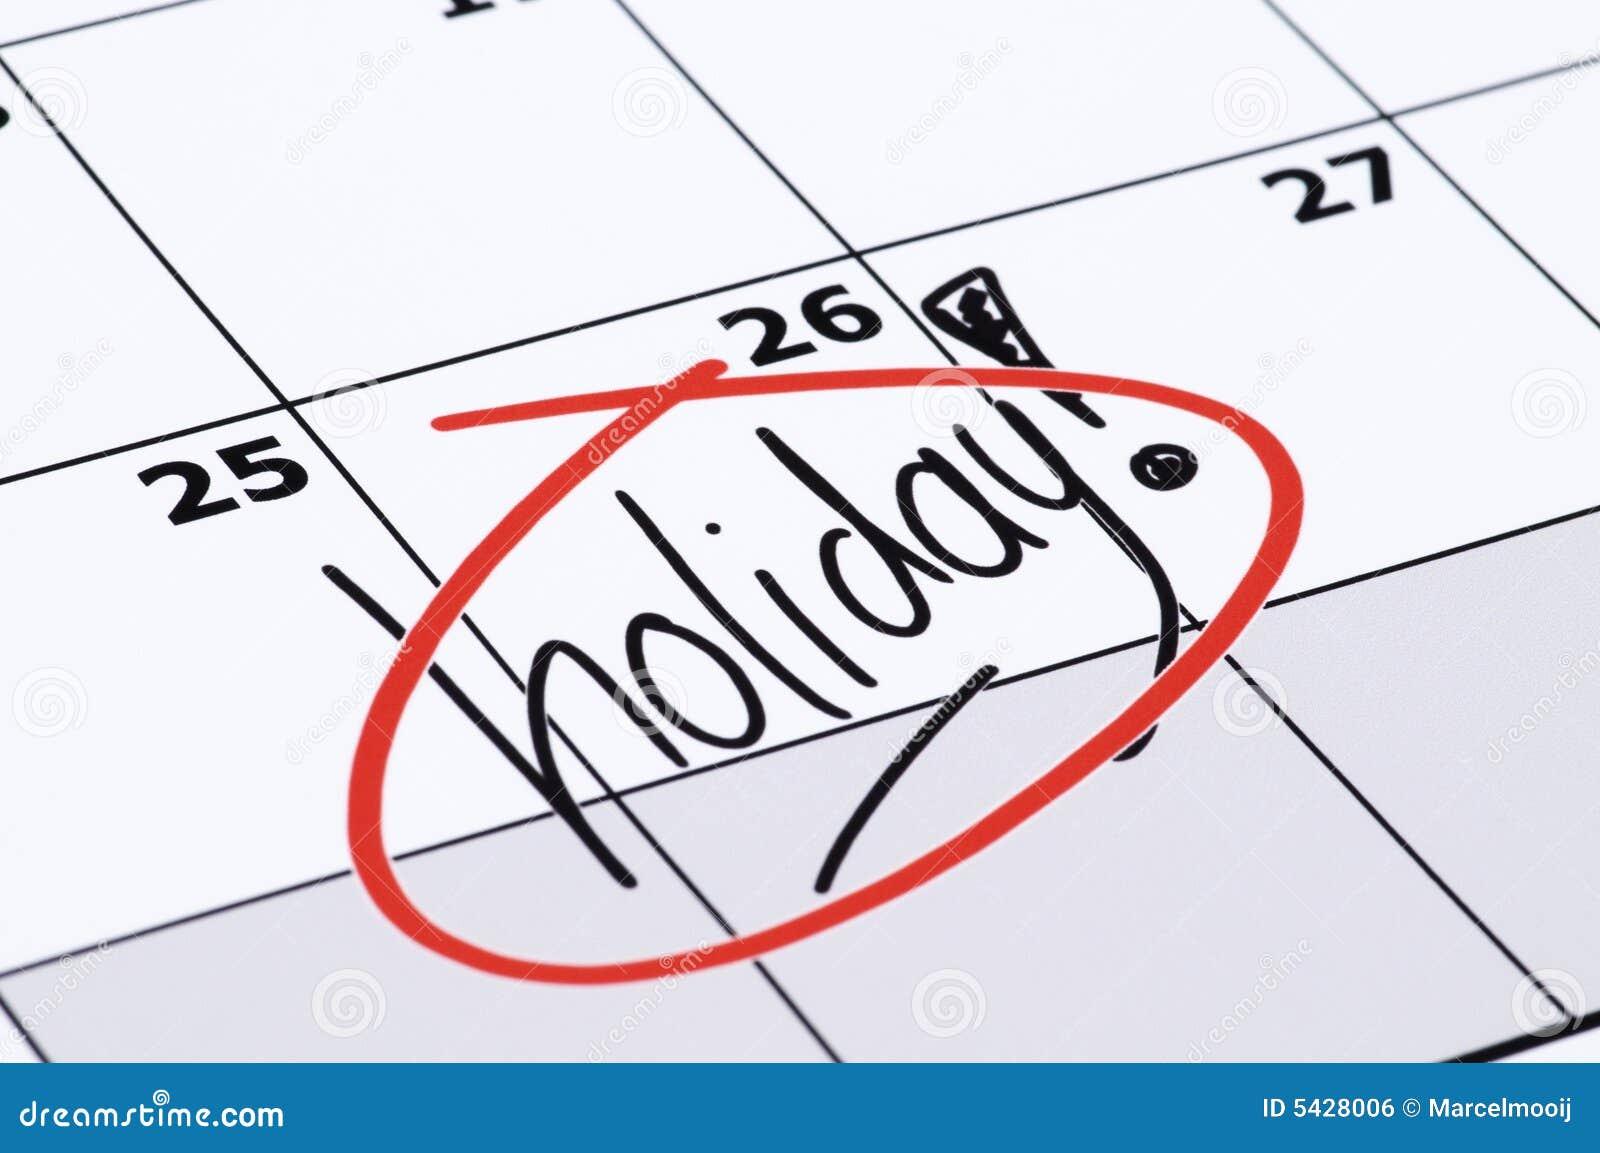 Finally Holiday Royalty Free Stock Image - Image: 5428006